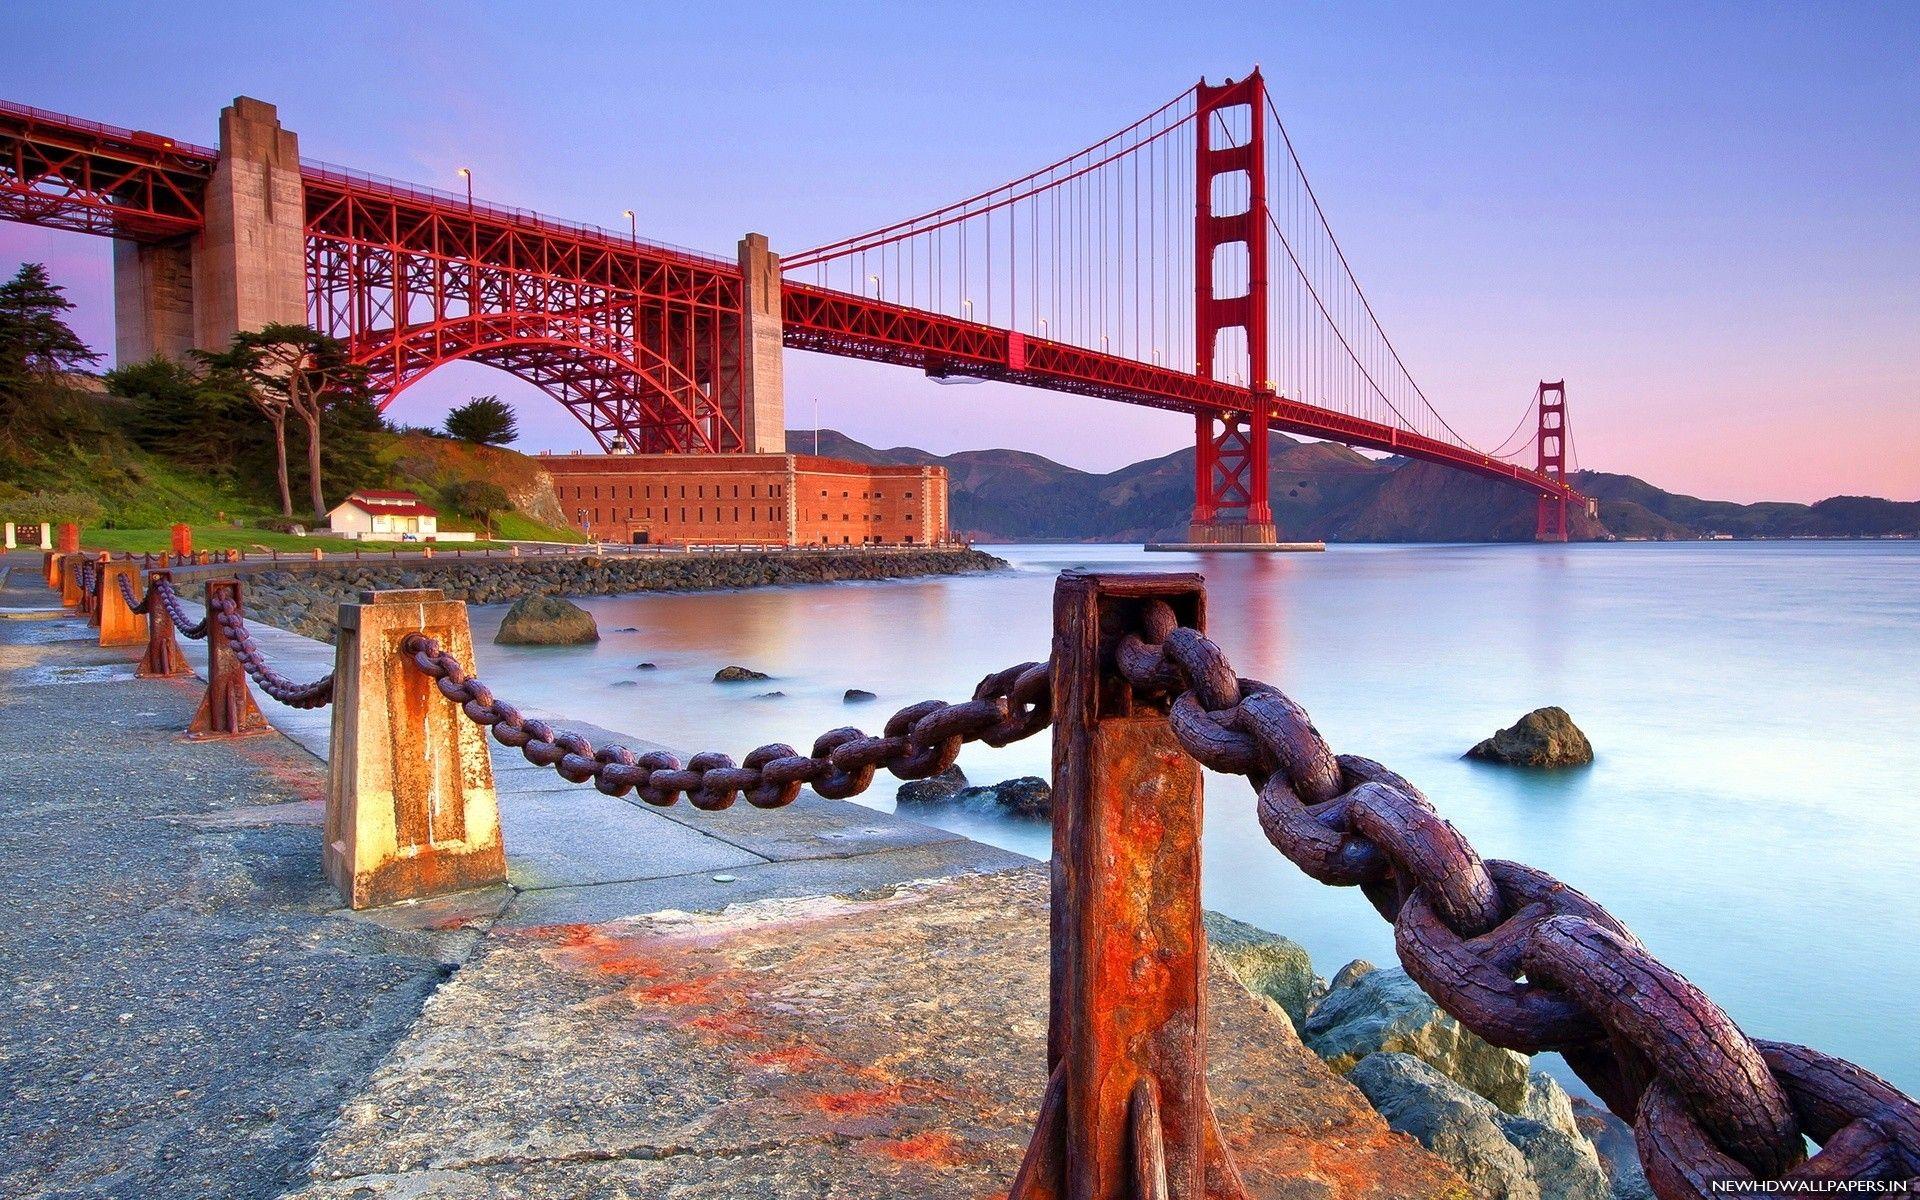 Golden Gate Bridge Coast Nice City Hd Wallpaper Jpg 1920 1200 Puente Golden Gate San Francisco Eeuu Puentes